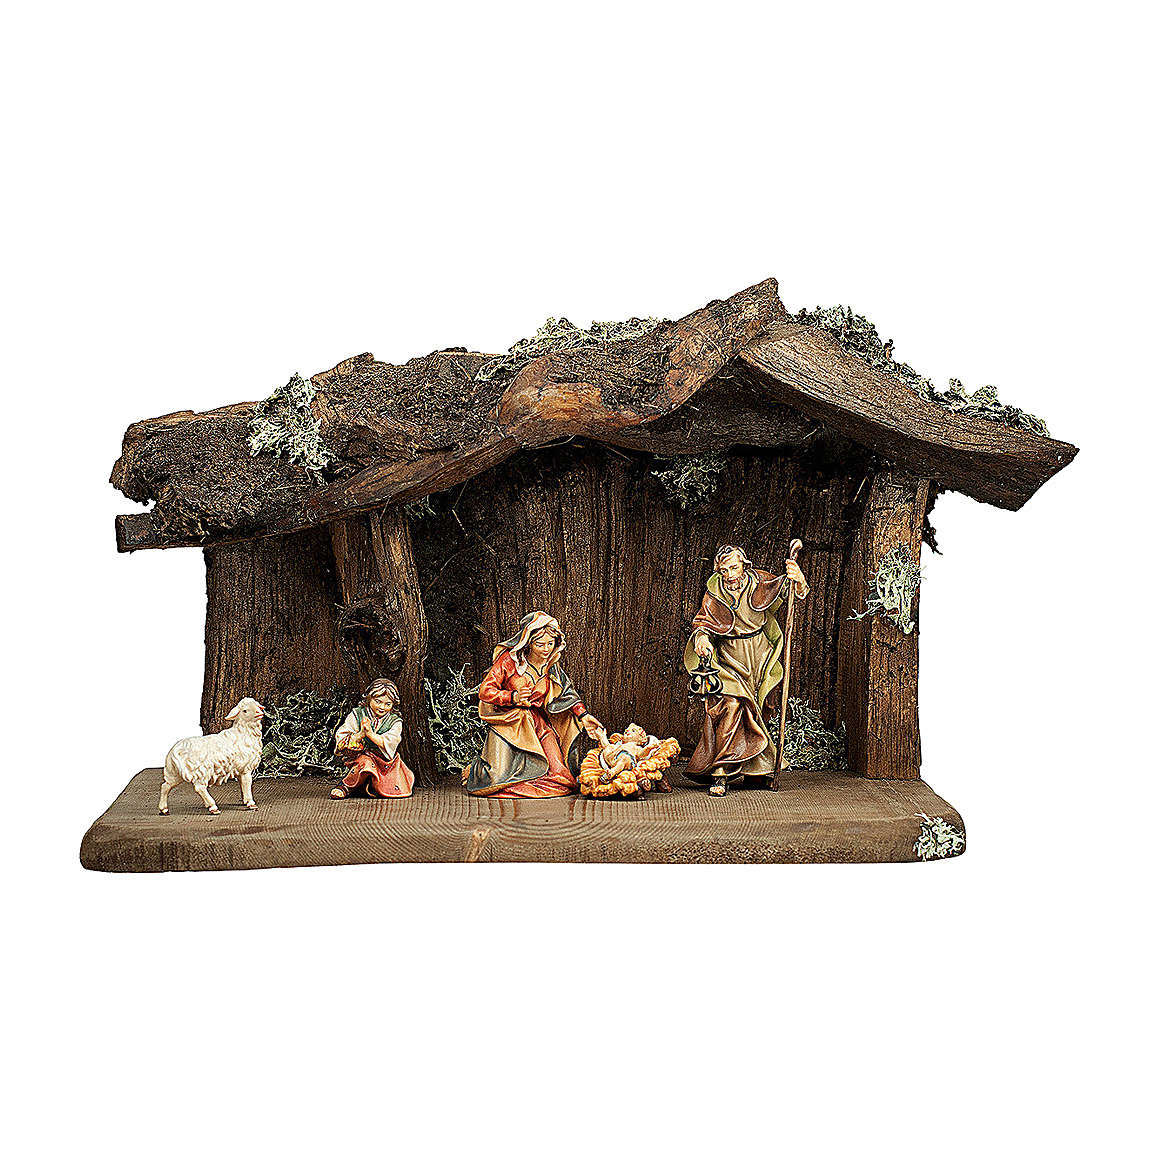 Sacra famiglia nella grotta presepe Original legno dipinto in Valgardena 10 cm - 5 pz 4